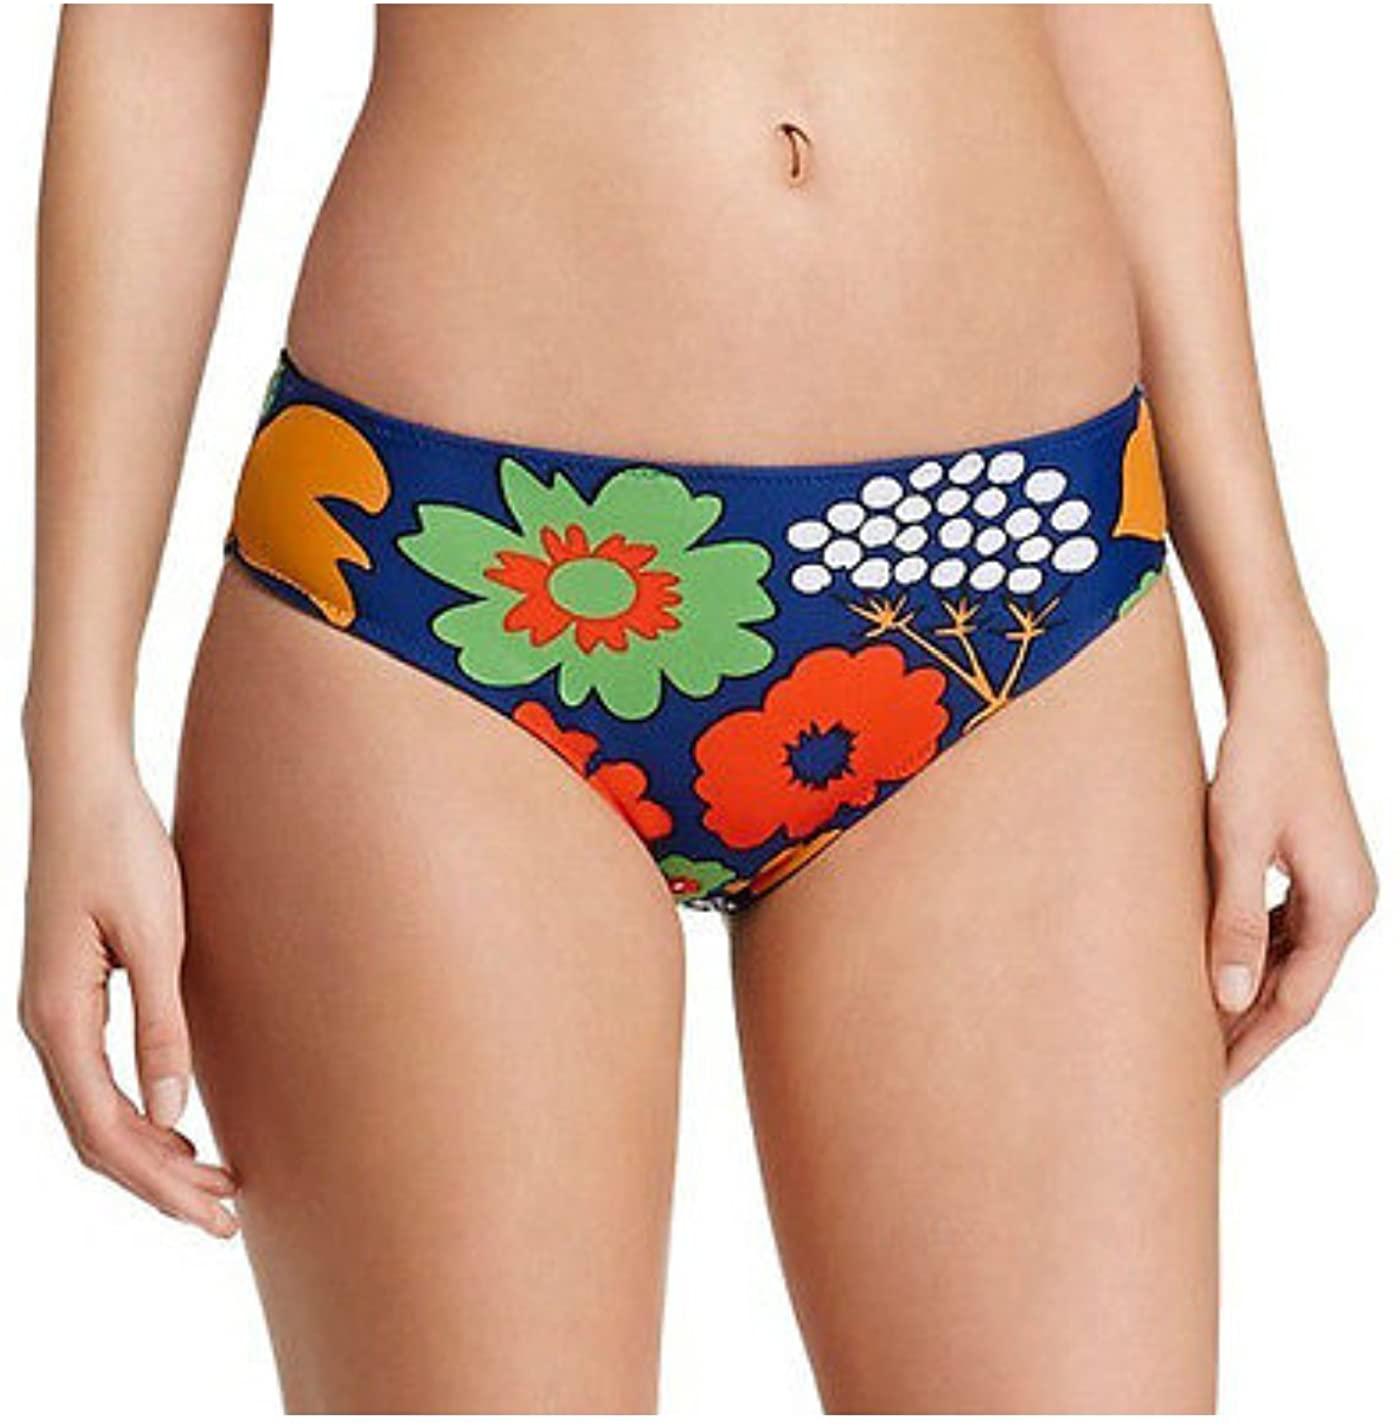 Marimekko Reversible Bikini Swimsuit Bottom Kukkatori Primary Print and Blue